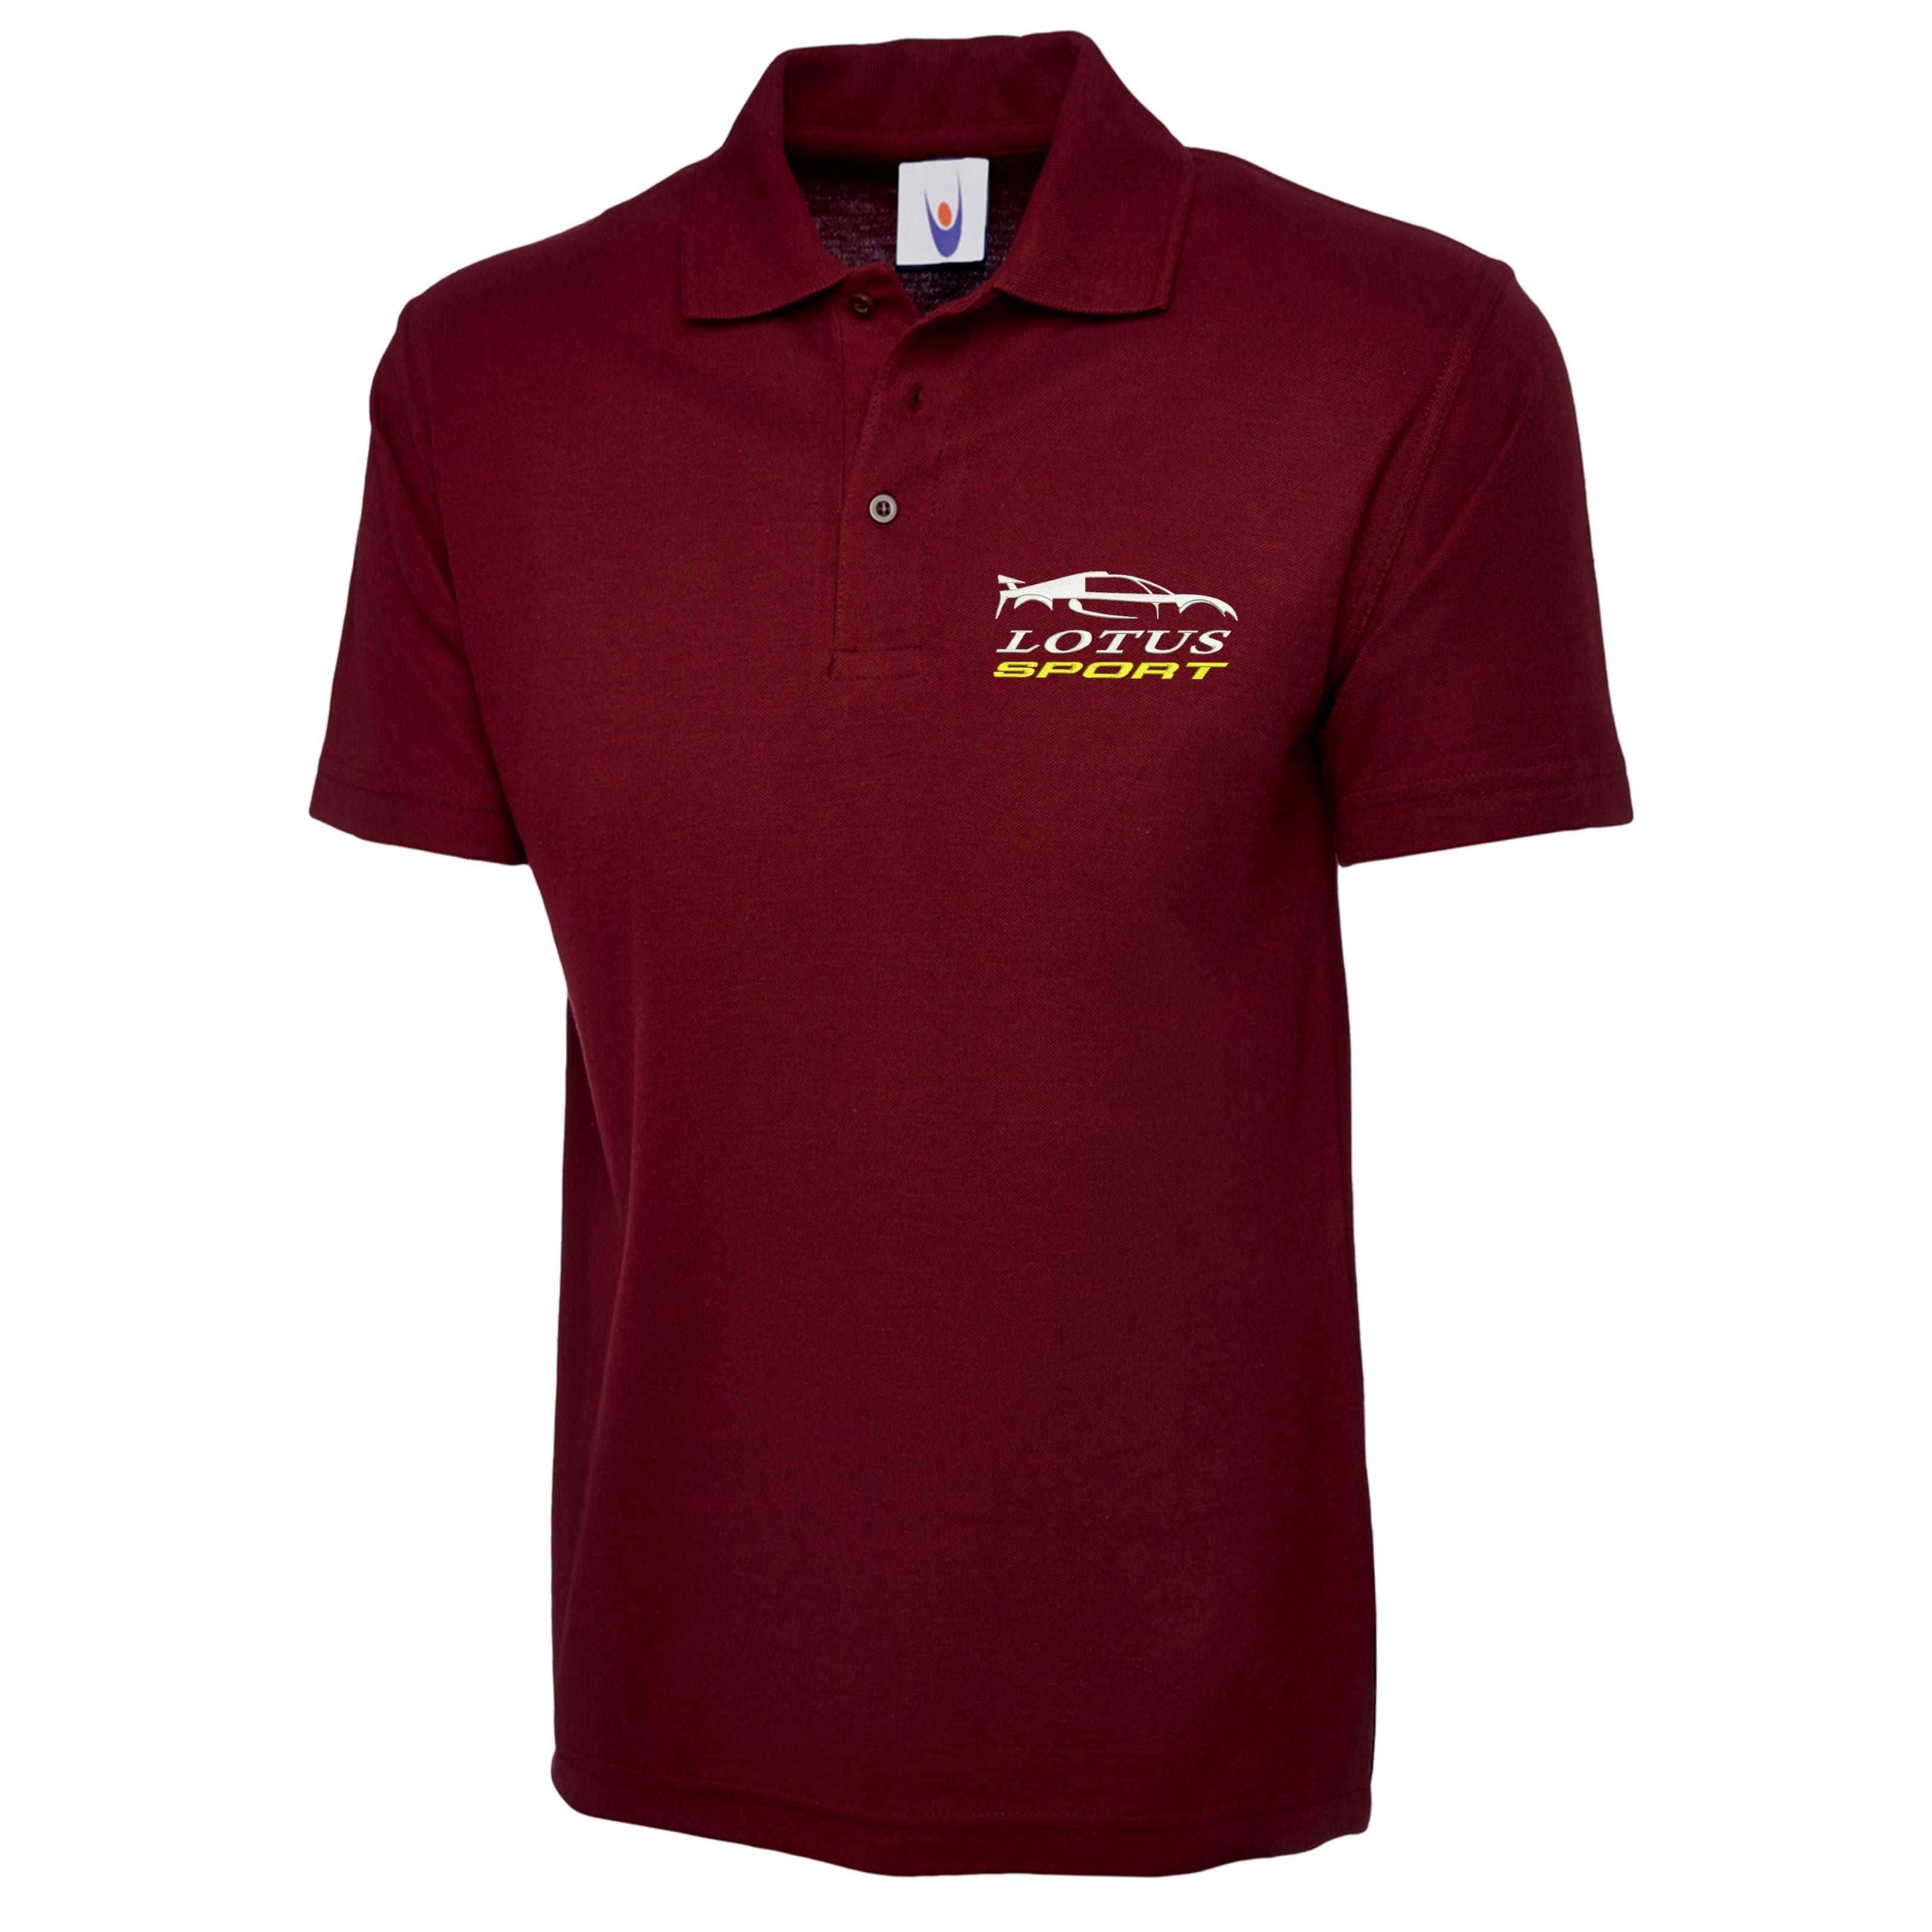 Embroidered Lotus Sports Polo Shirt Workwear Uniform Lotus Sports